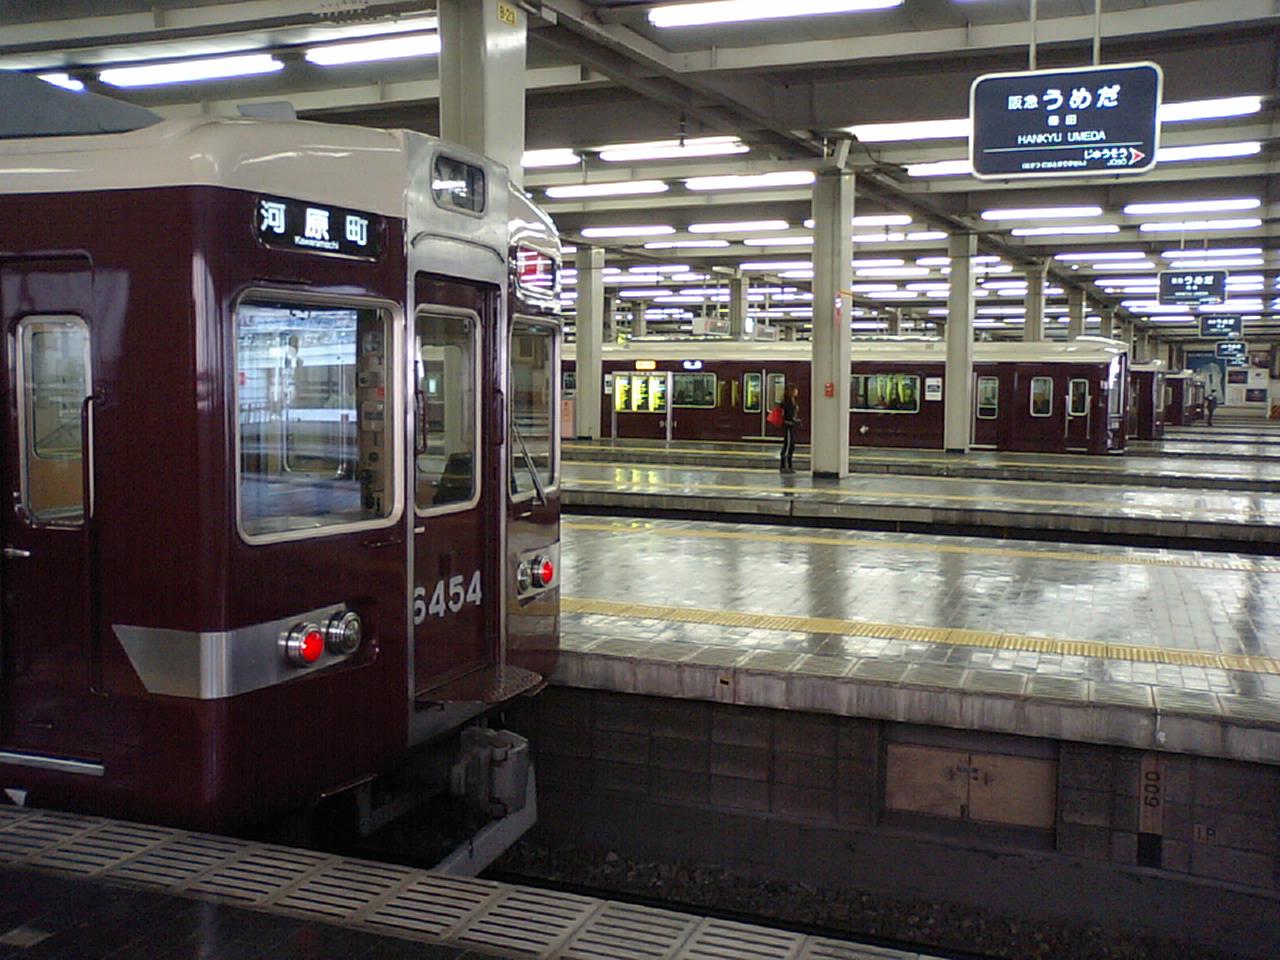 """Hankyu Umeda station1"" by 本屋 - 本屋's file (self-made). Licensed under CC 表示-継承 3.0 via ウィキメディア・コモンズ."